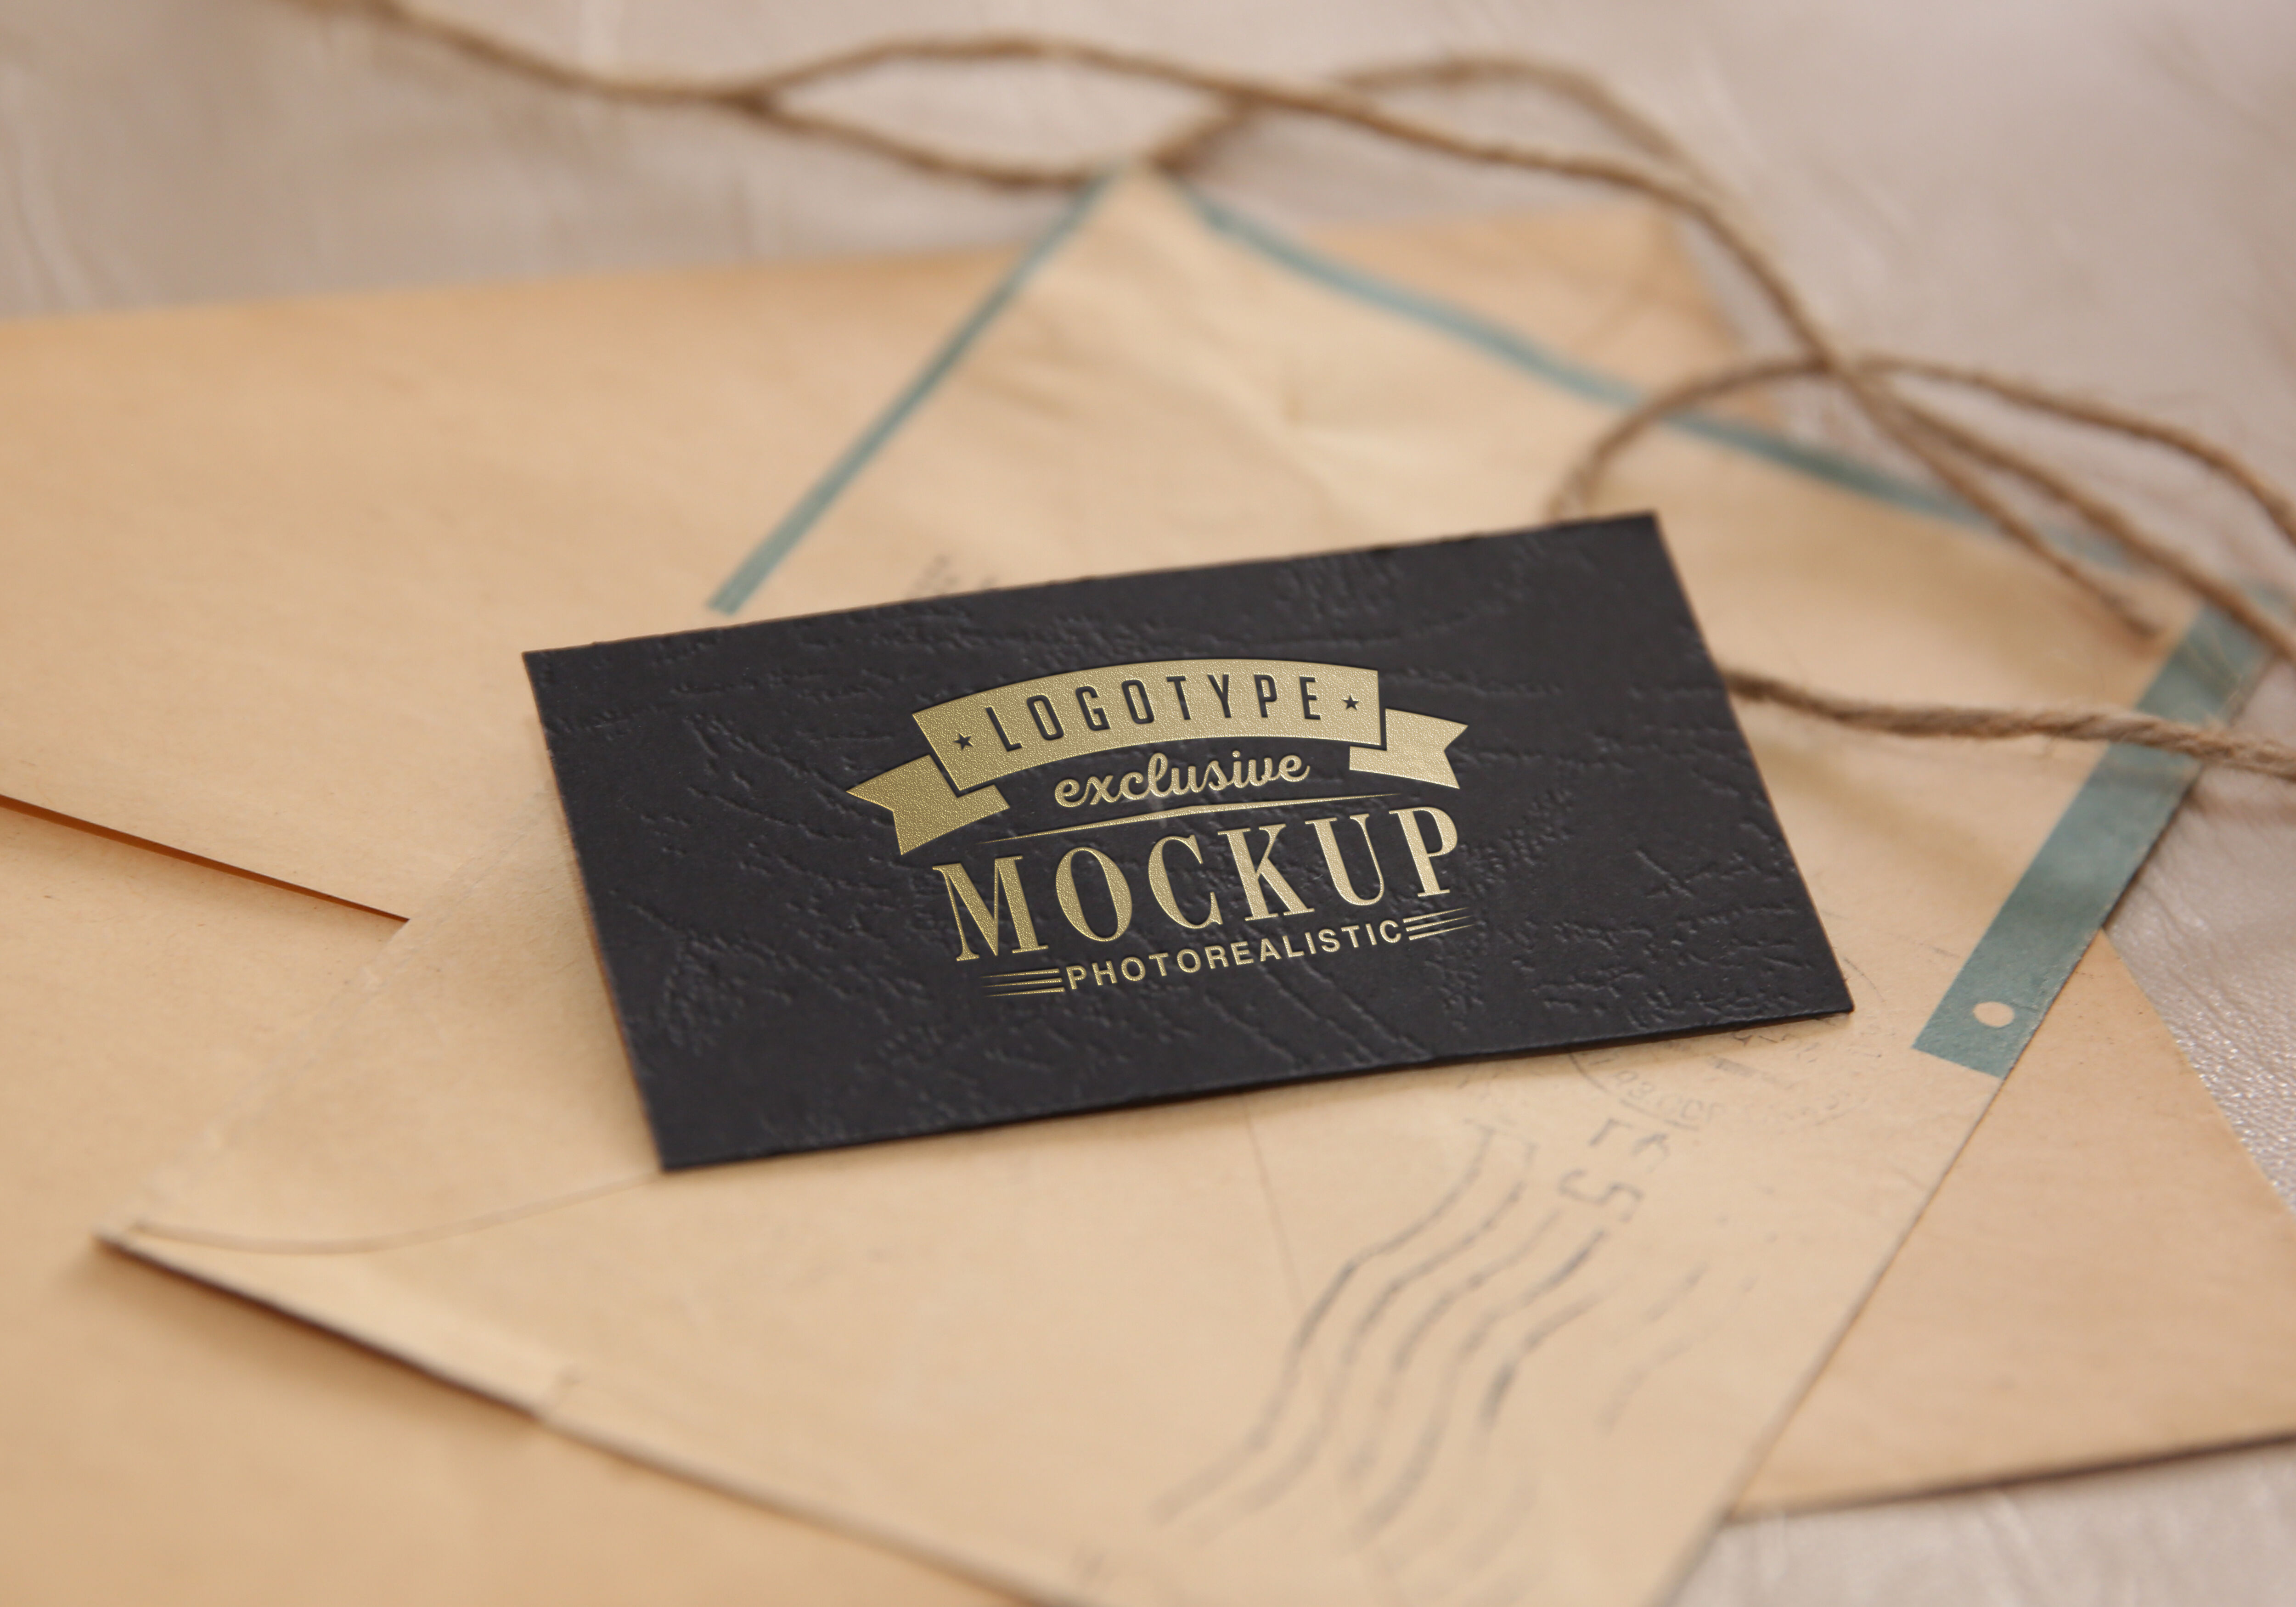 Photo Realistic Mock Ups Vintage Style On Old Envelopes Background